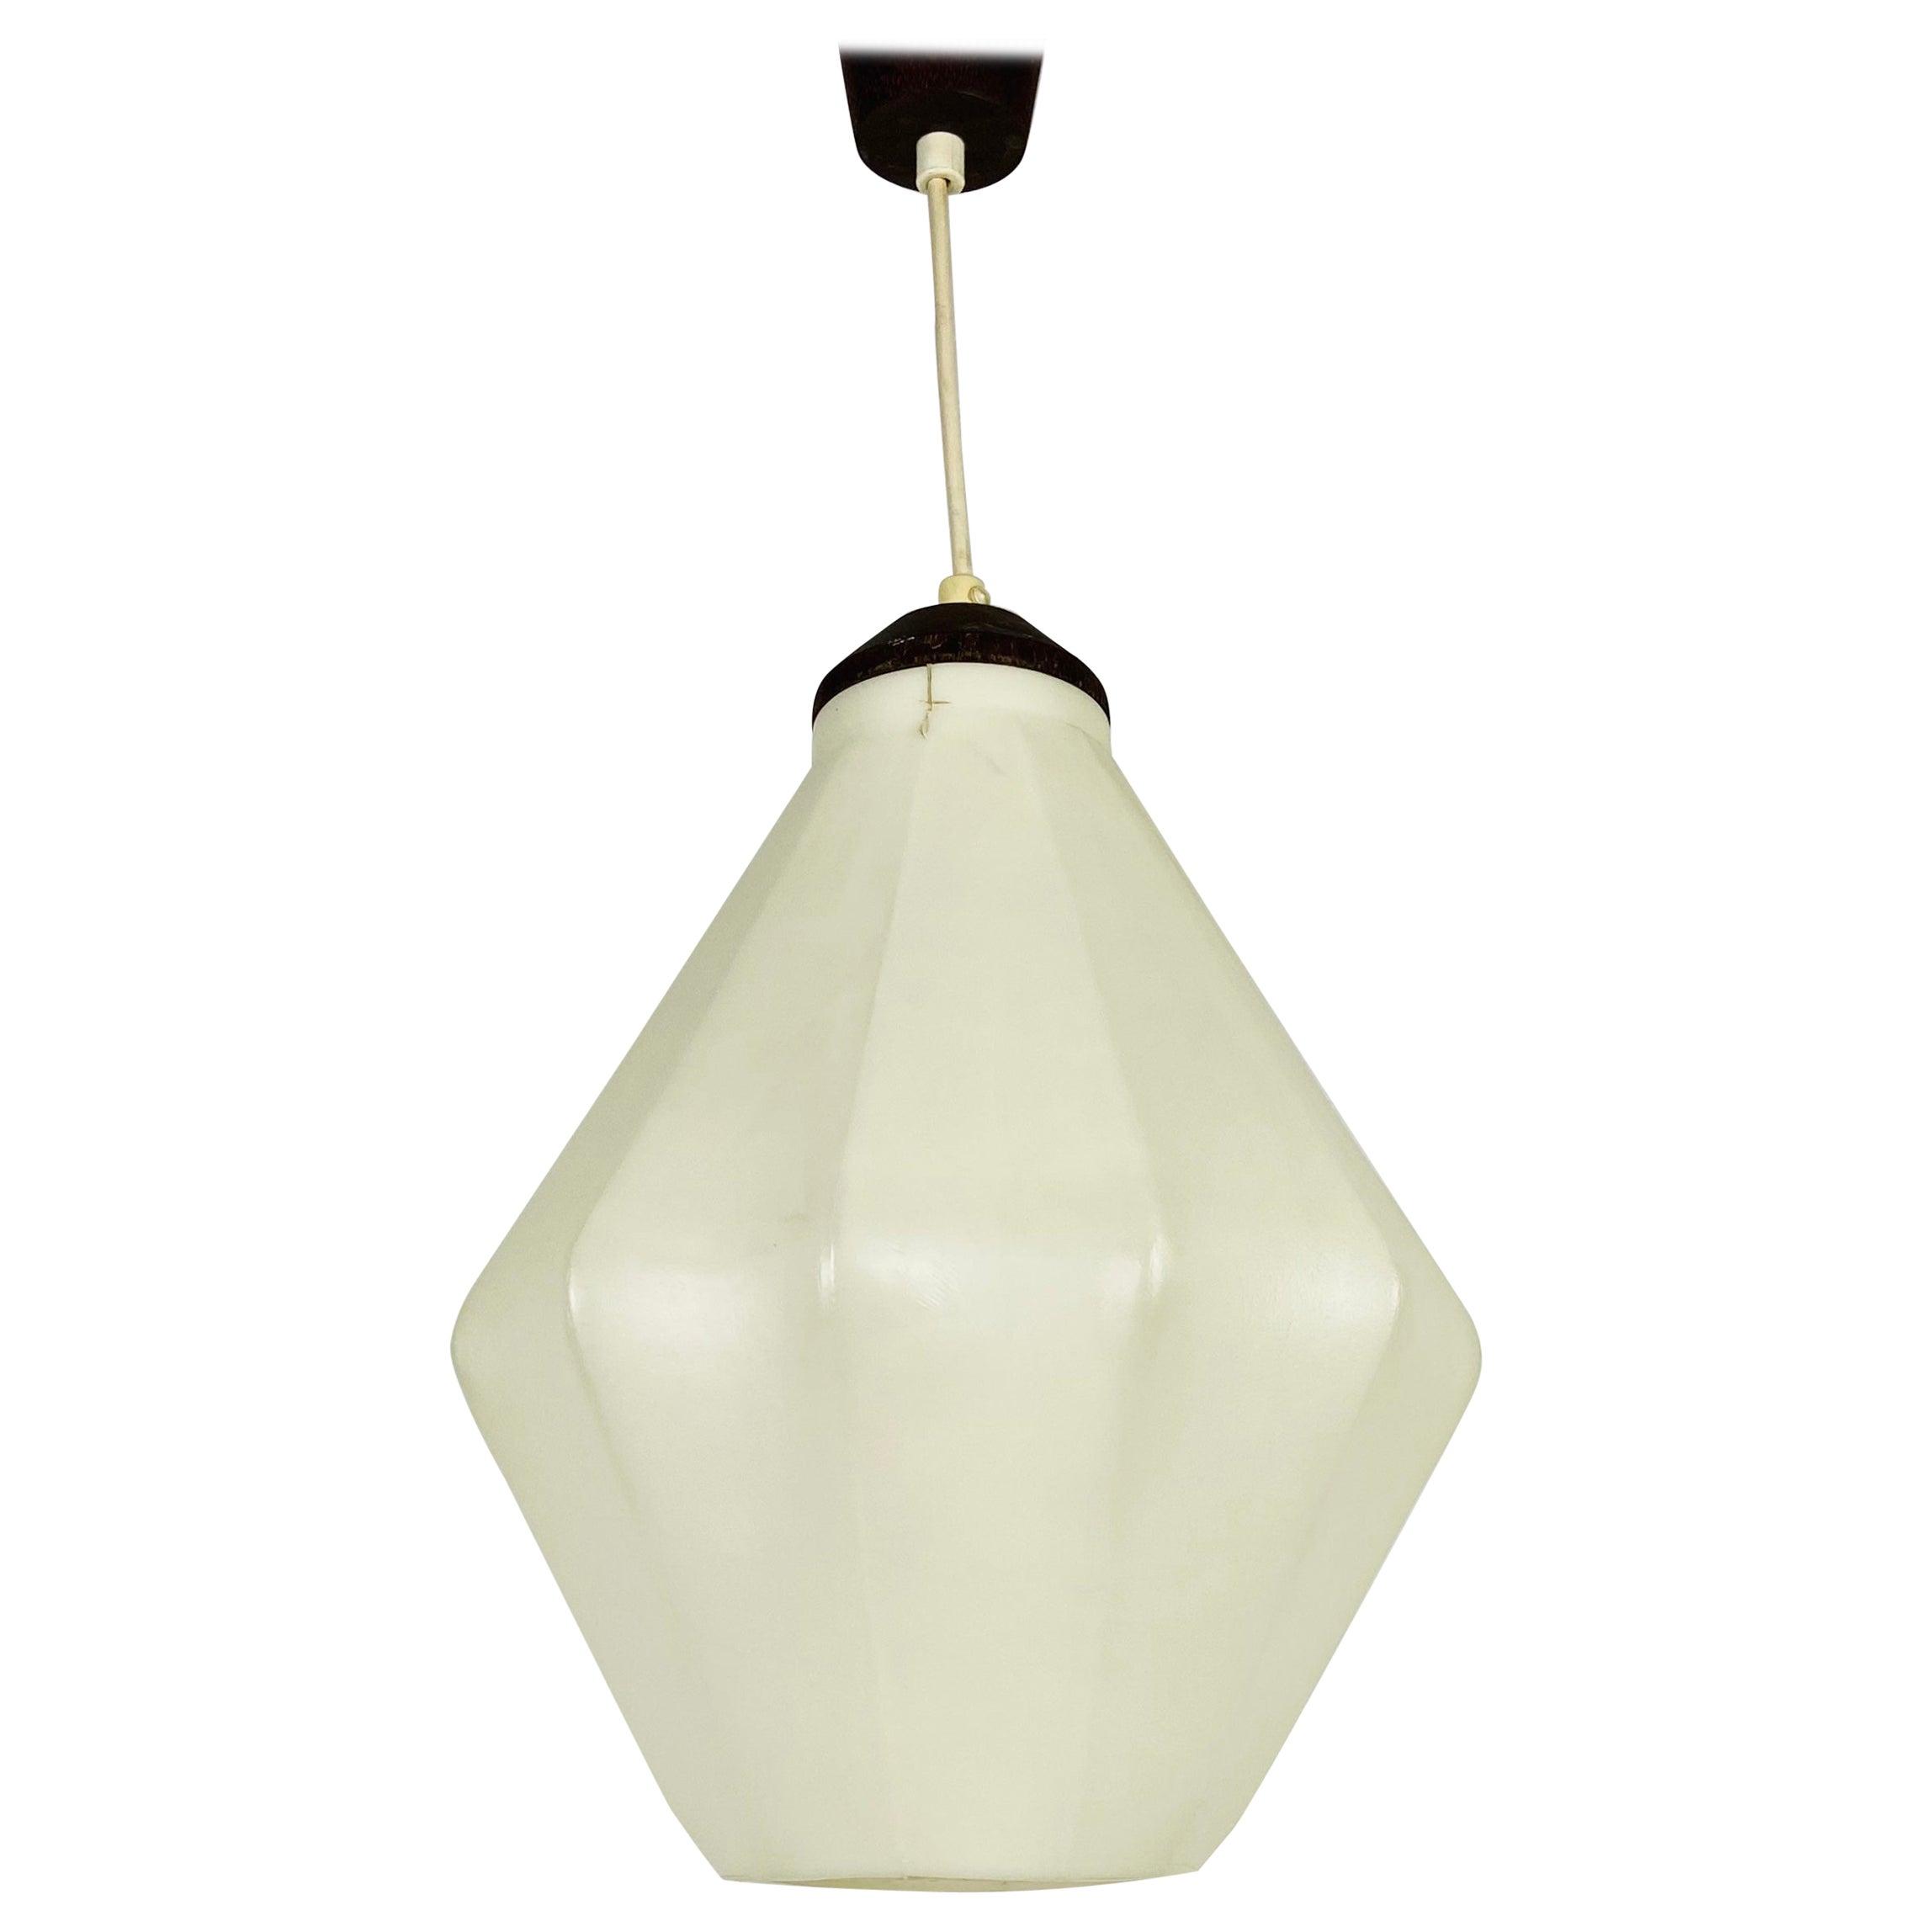 Losange Cocoon Pendant Light in the Style of Achille Castiglioni, 1960s, Italy